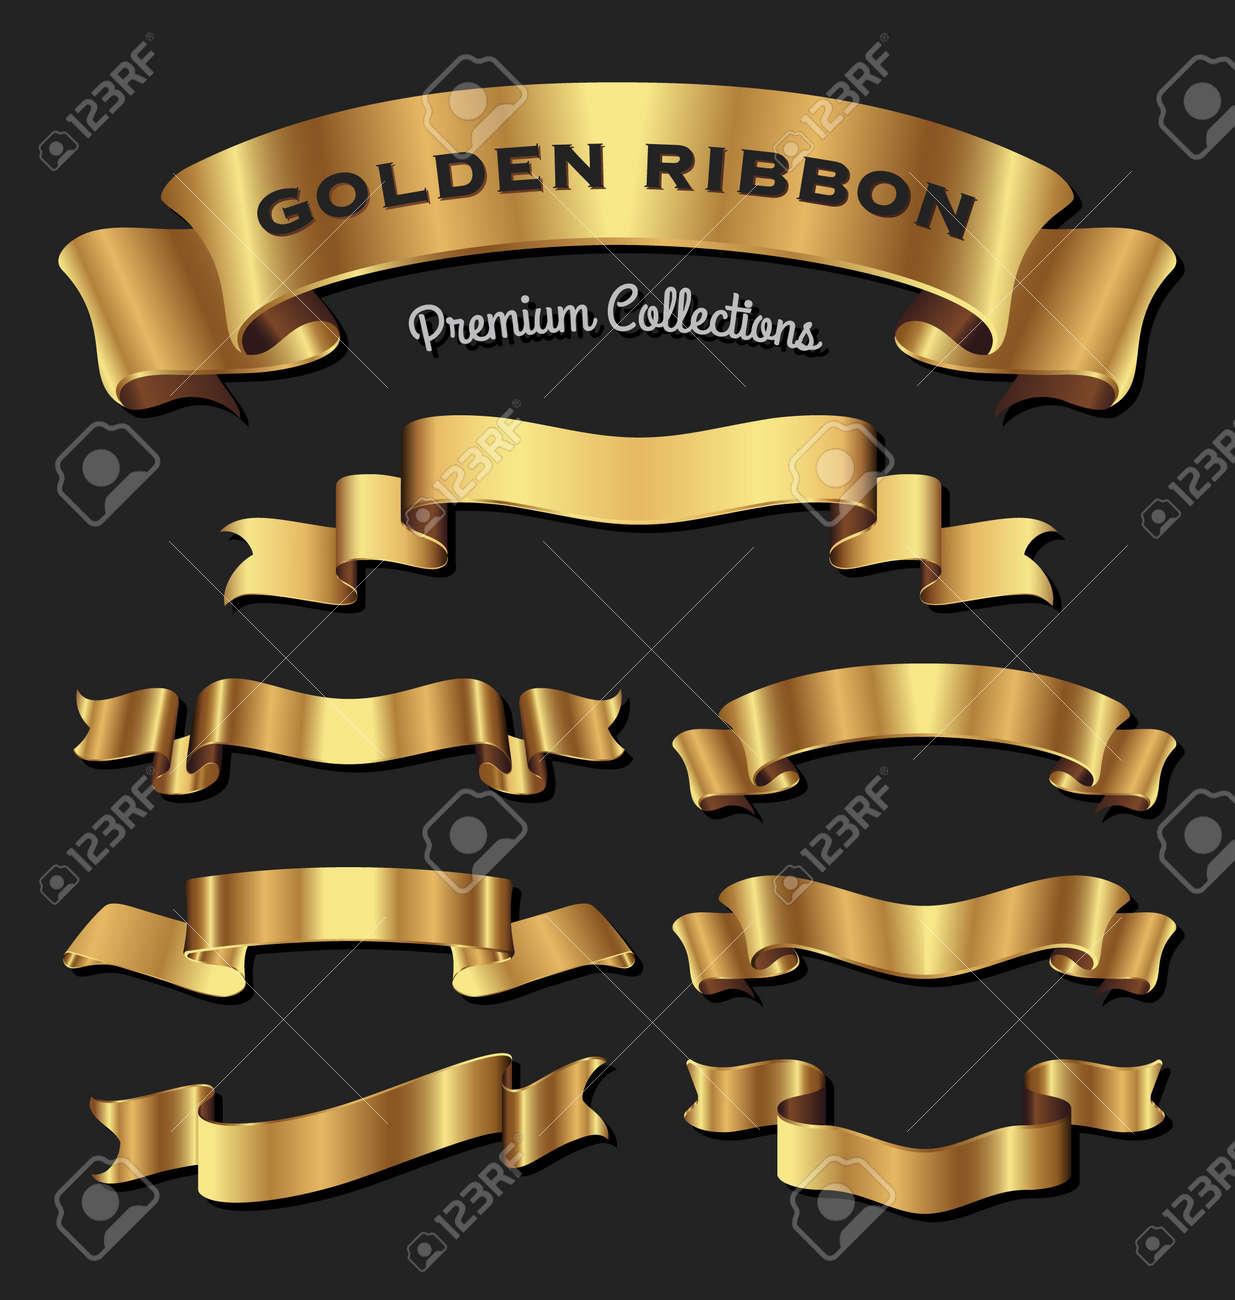 Set of premium golden ribbons for your design. Vector illustration - 56089775